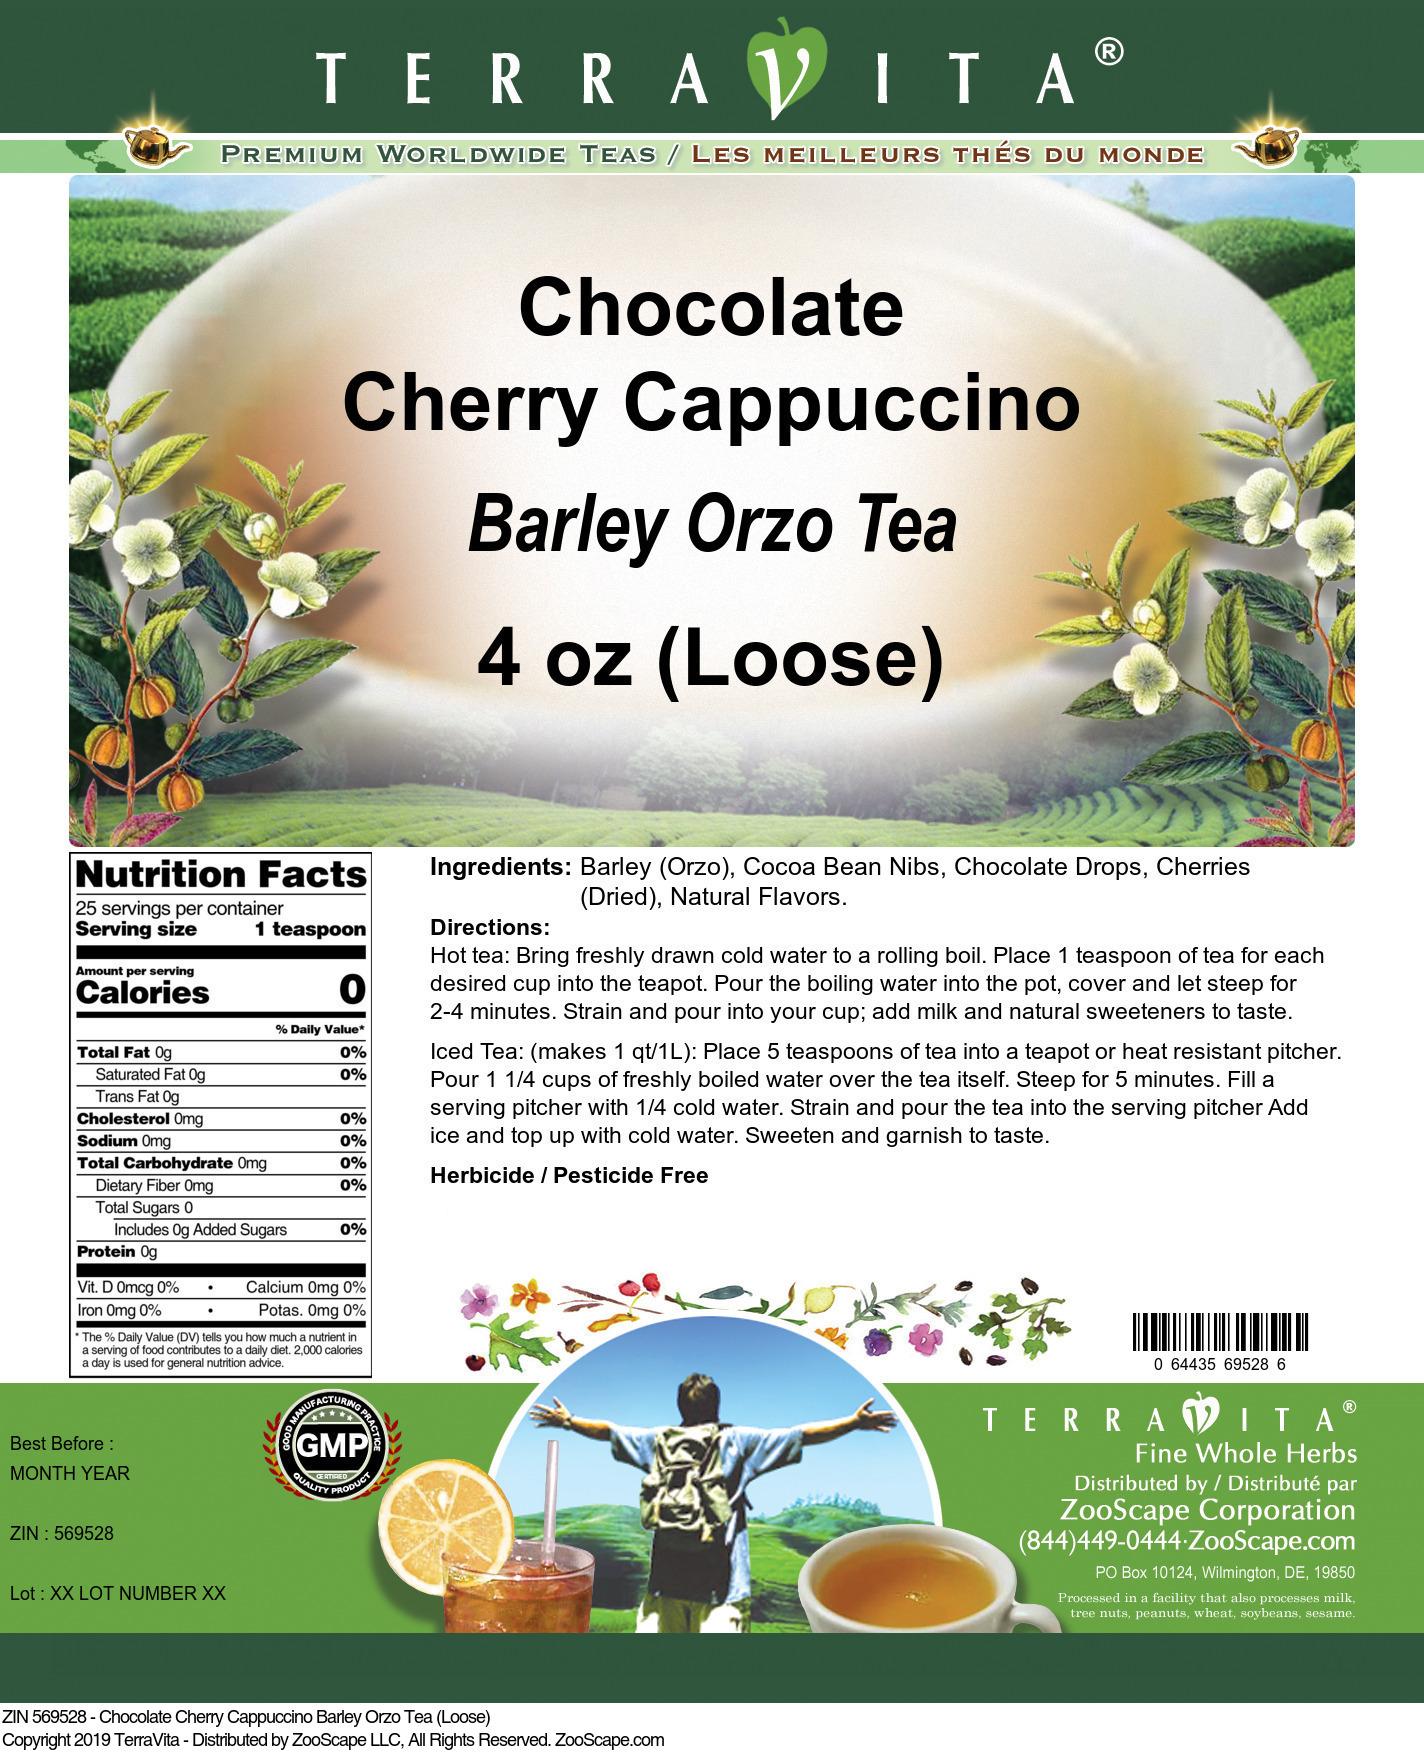 Chocolate Cherry Cappuccino Barley Orzo